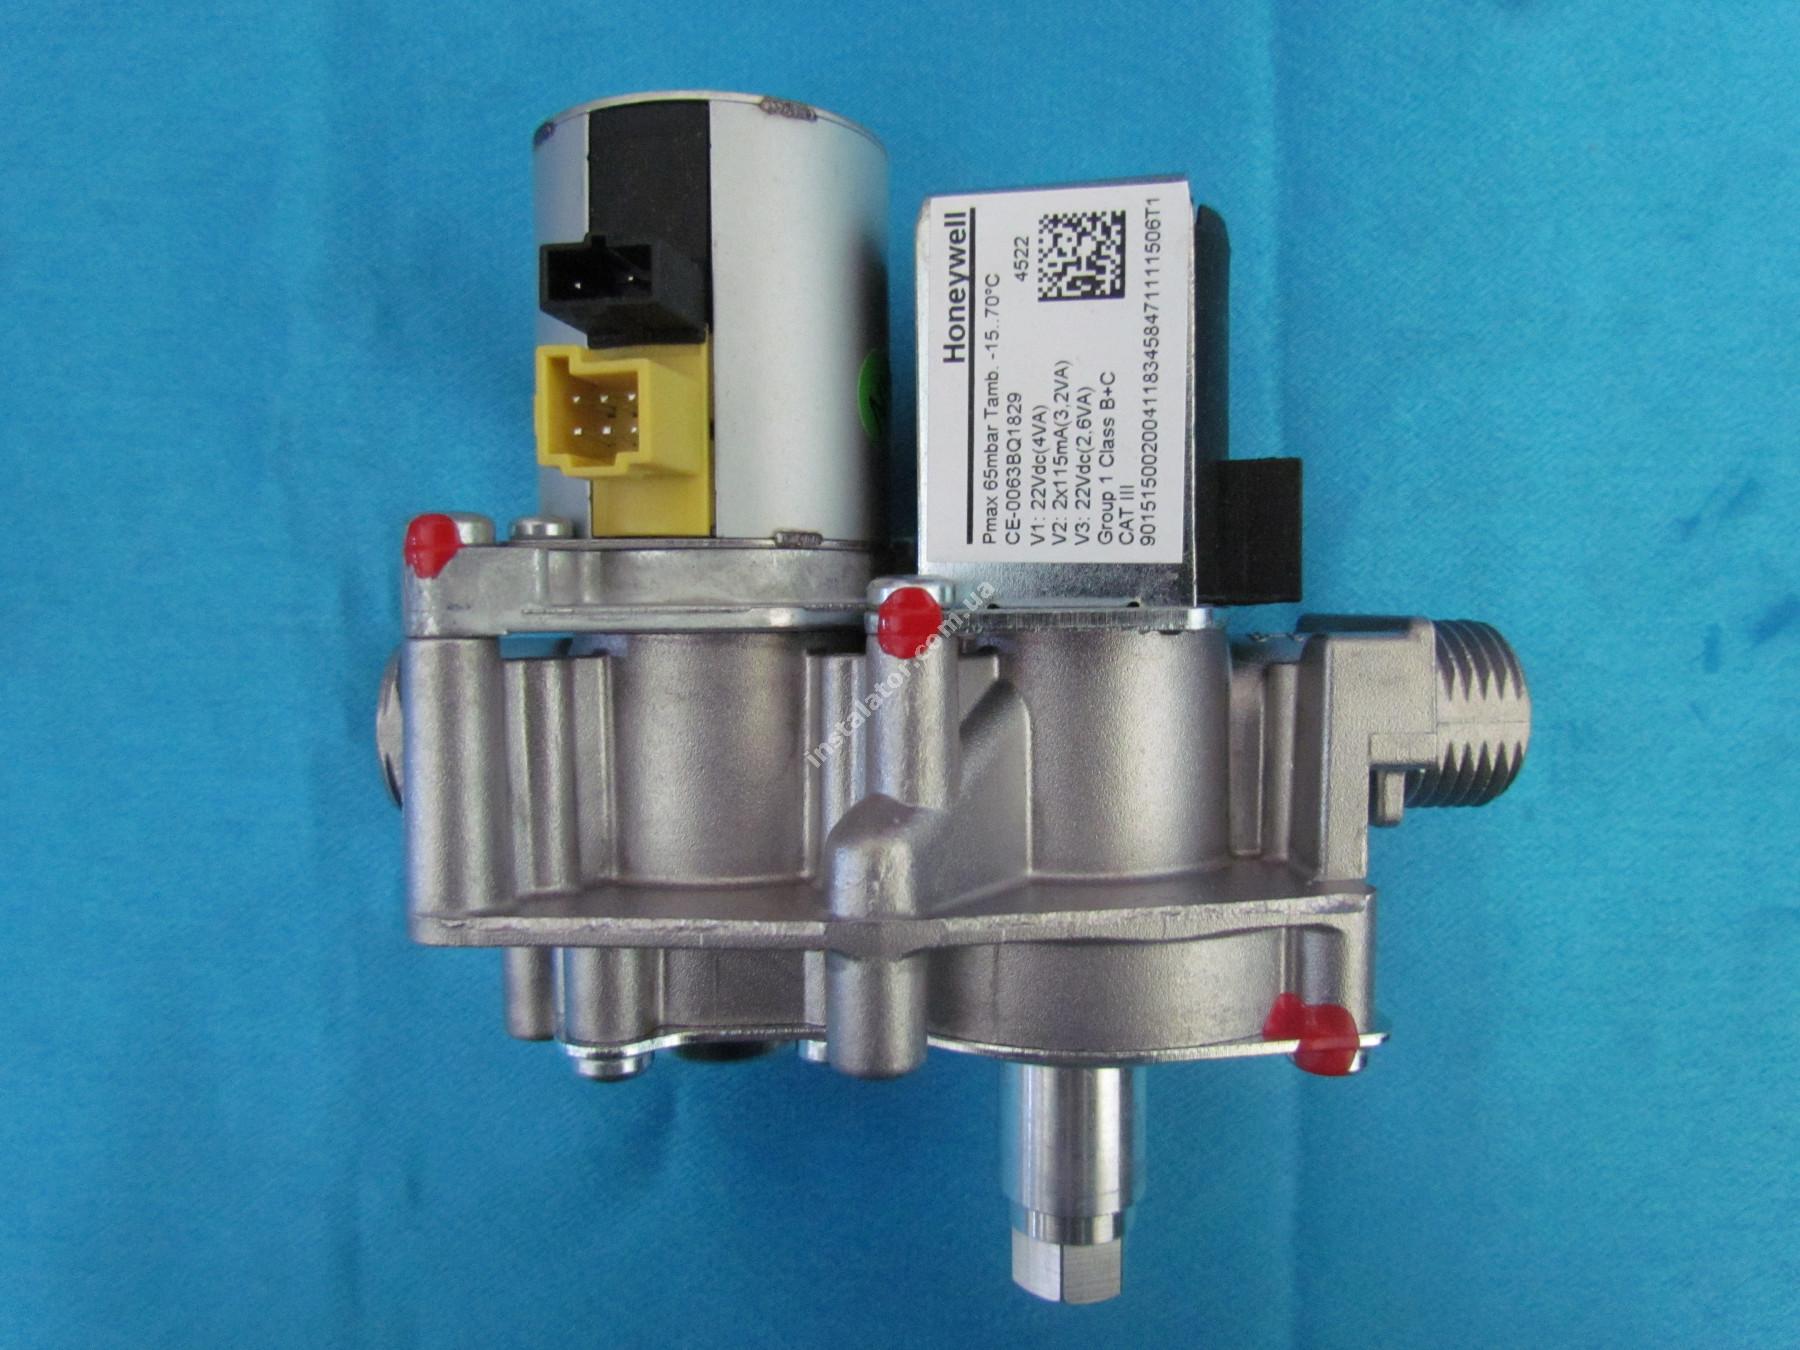 0020049296 Газовый клапан с регулятором PROTHERM/VAILLANT/SAUNIAR DUVAL/ full-image-3